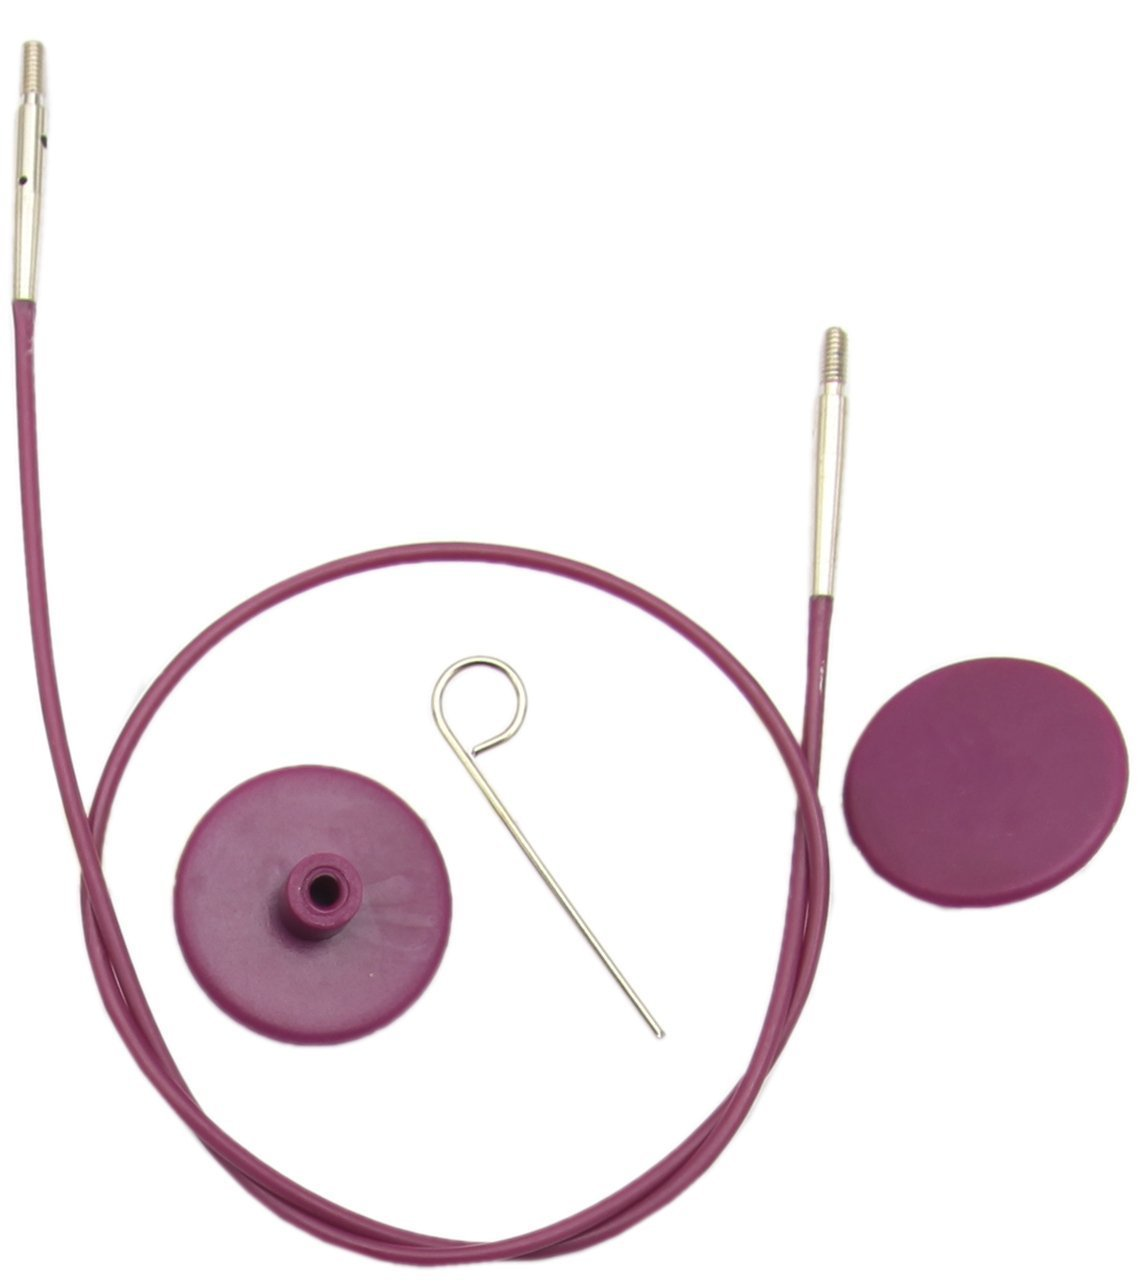 KnitPro Леска сменная Purple Silver 50 см 10561